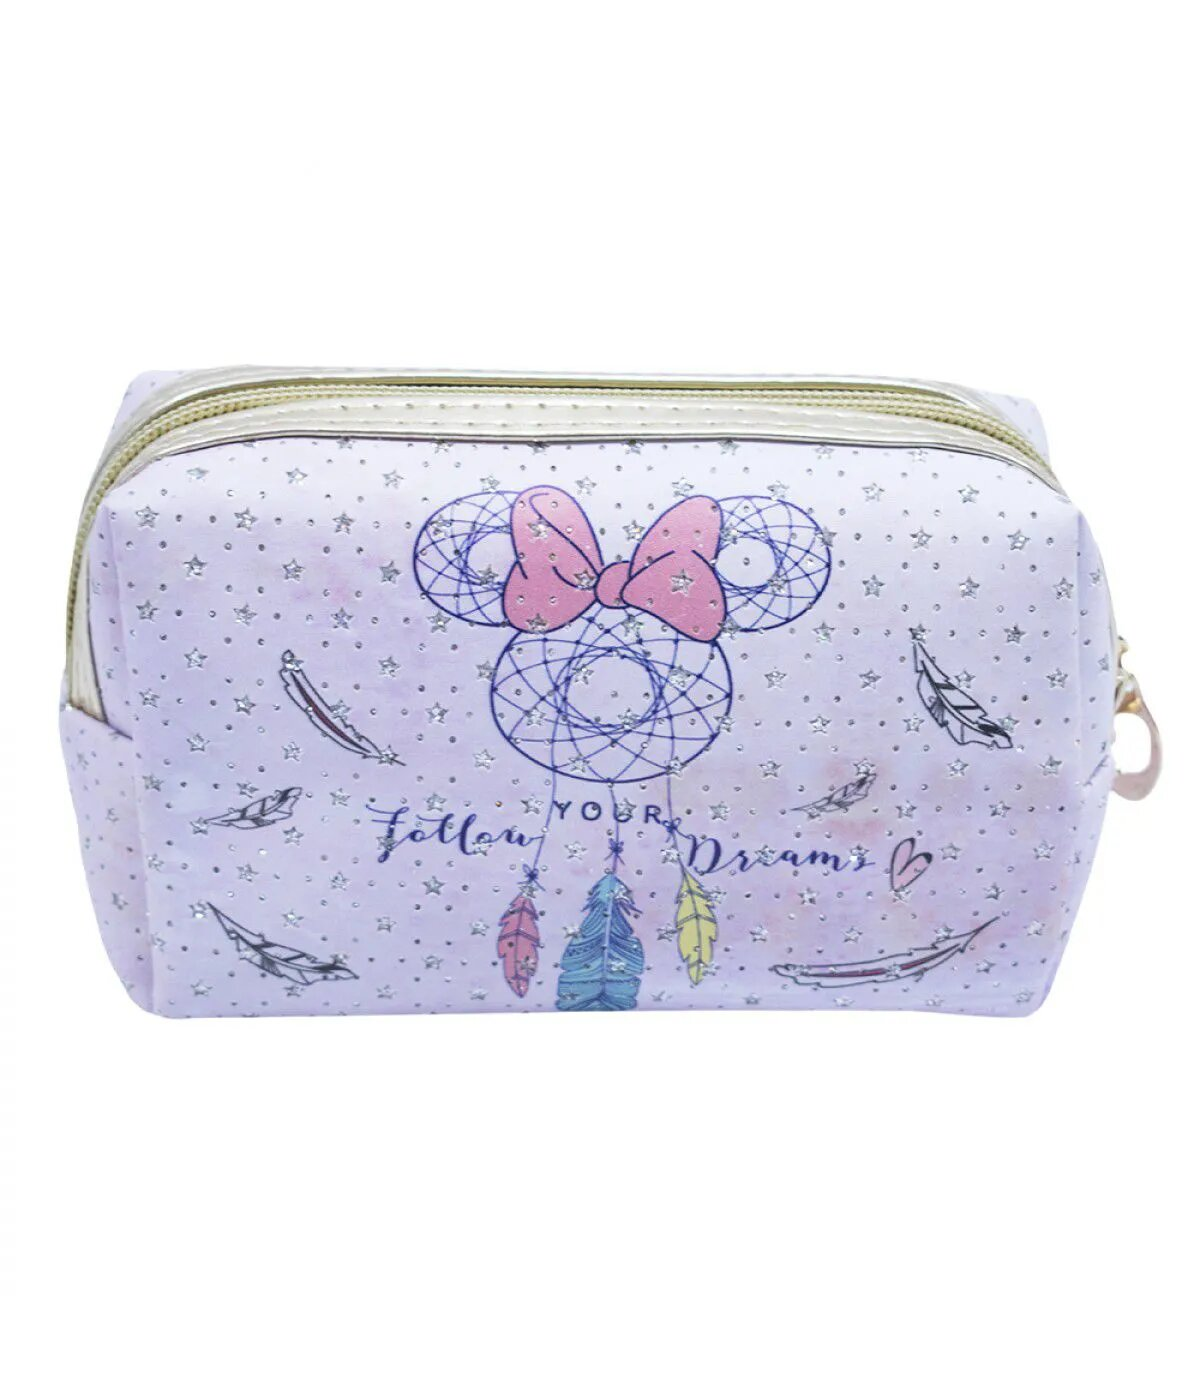 Necessaire: Minnie Mouse ''Follow Your Dreams'' Rosa (Pequena) - Disney